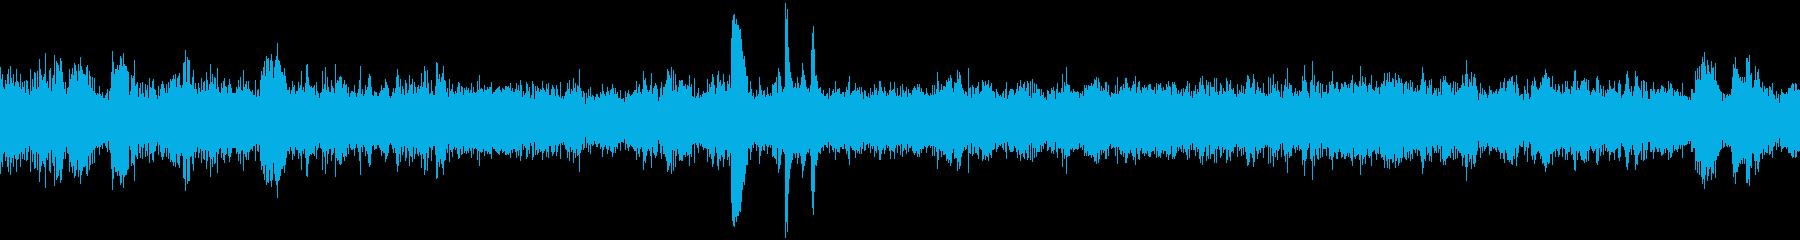 EC、列車の停車音(車内より収録)の再生済みの波形